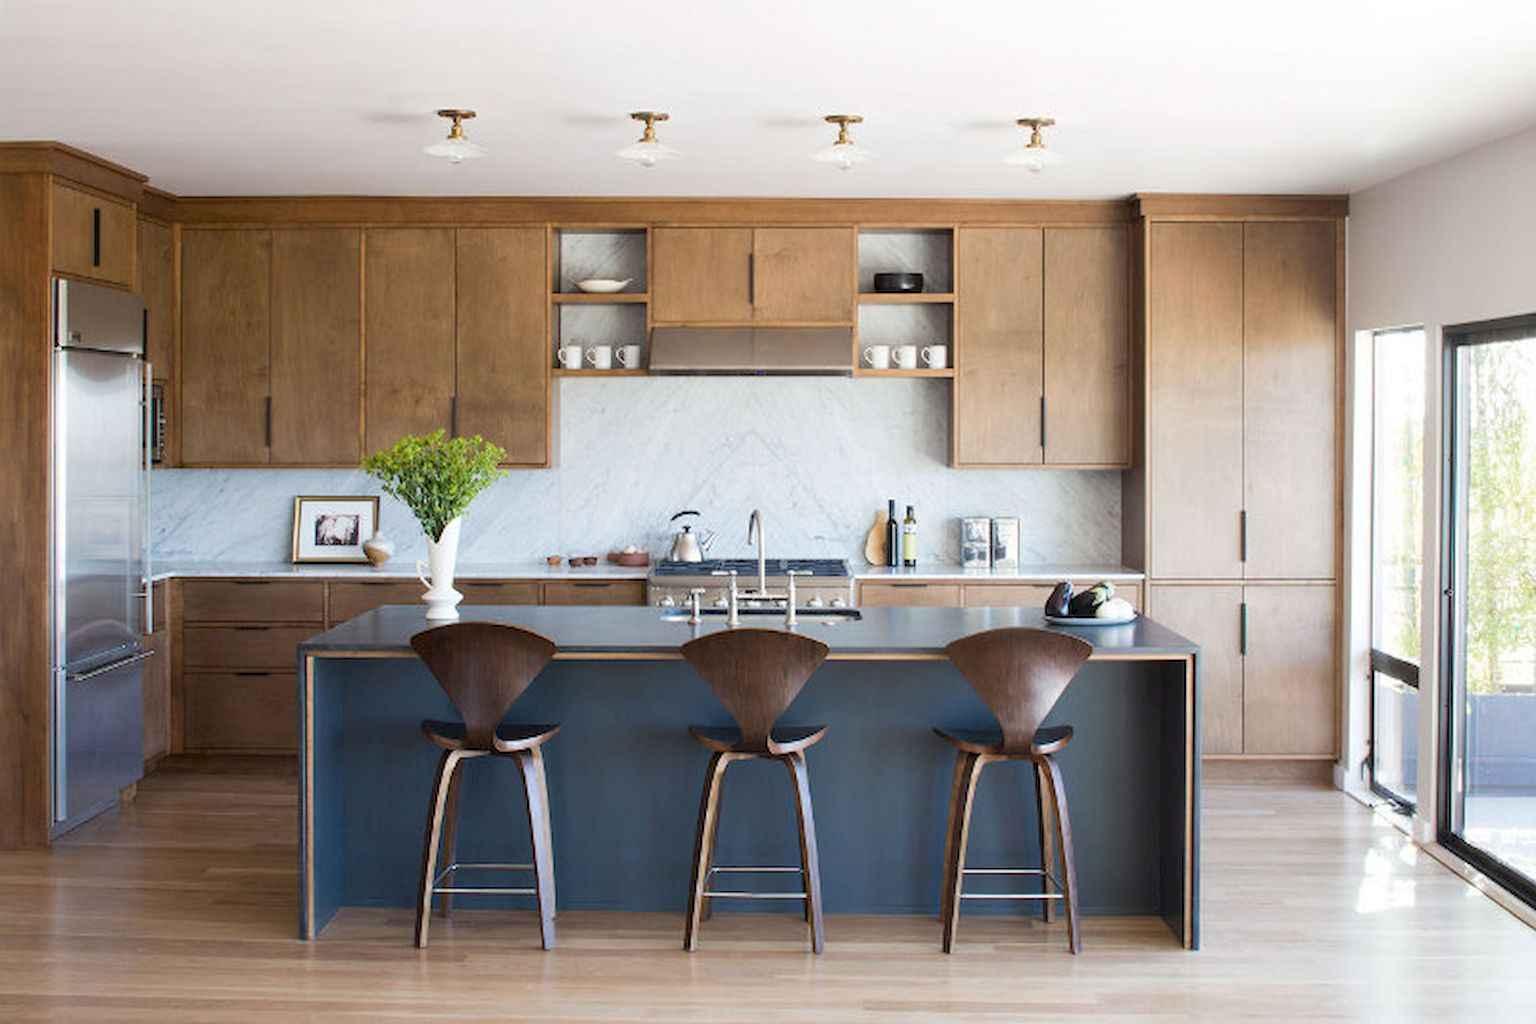 Mid century modern kitchen design ideas (2)